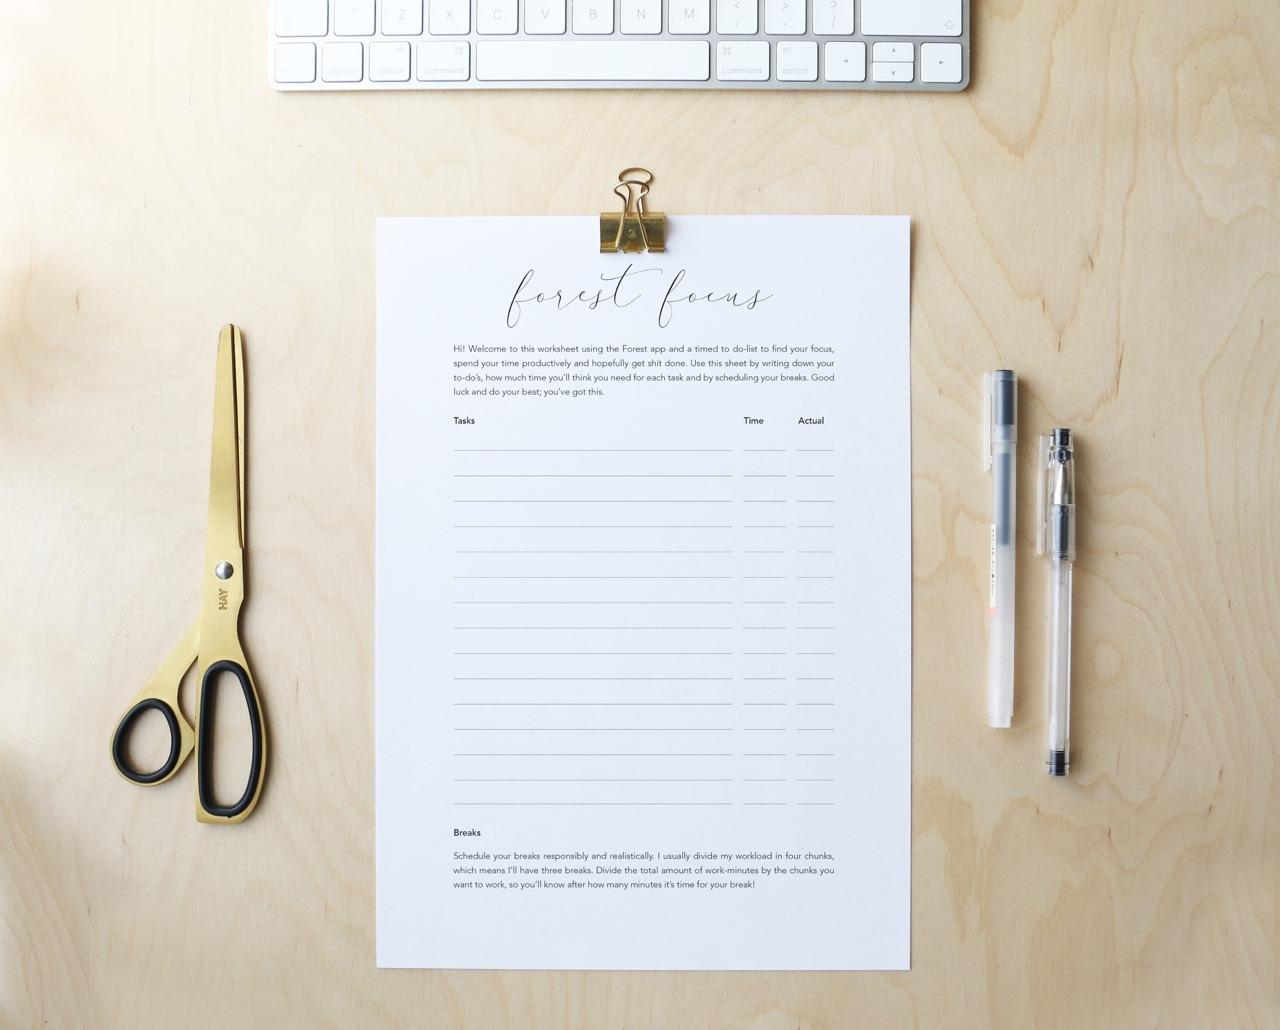 17 06 17 Printable Forest Focus Worksheet If